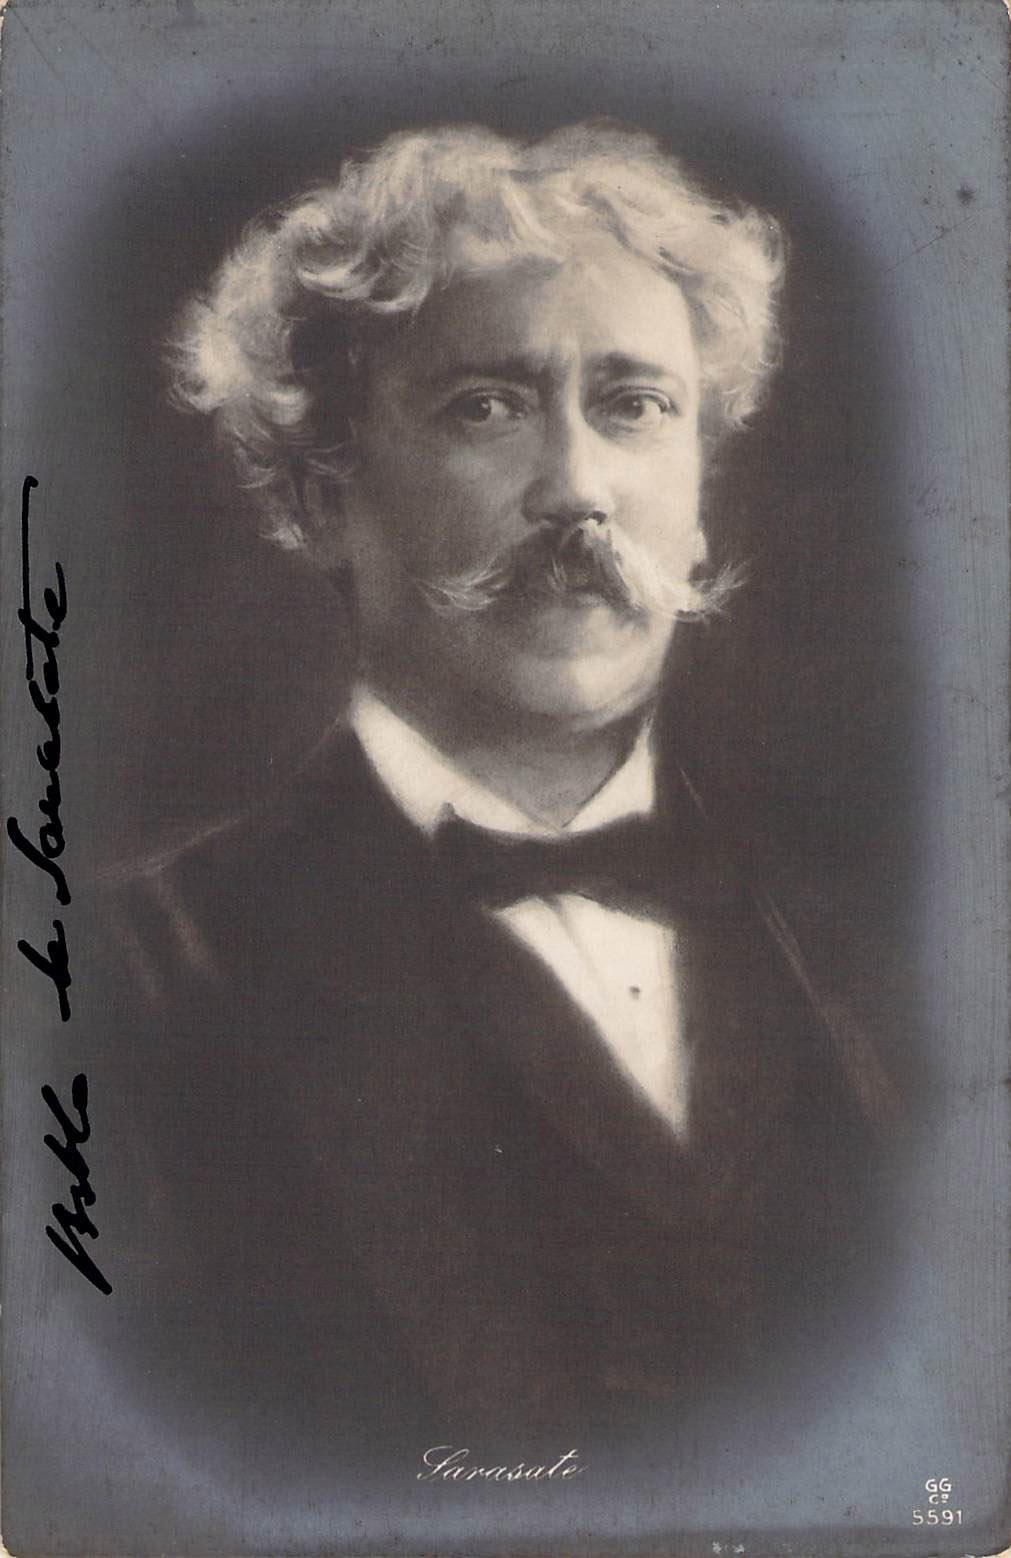 Pablo de Sarasate - signed photo